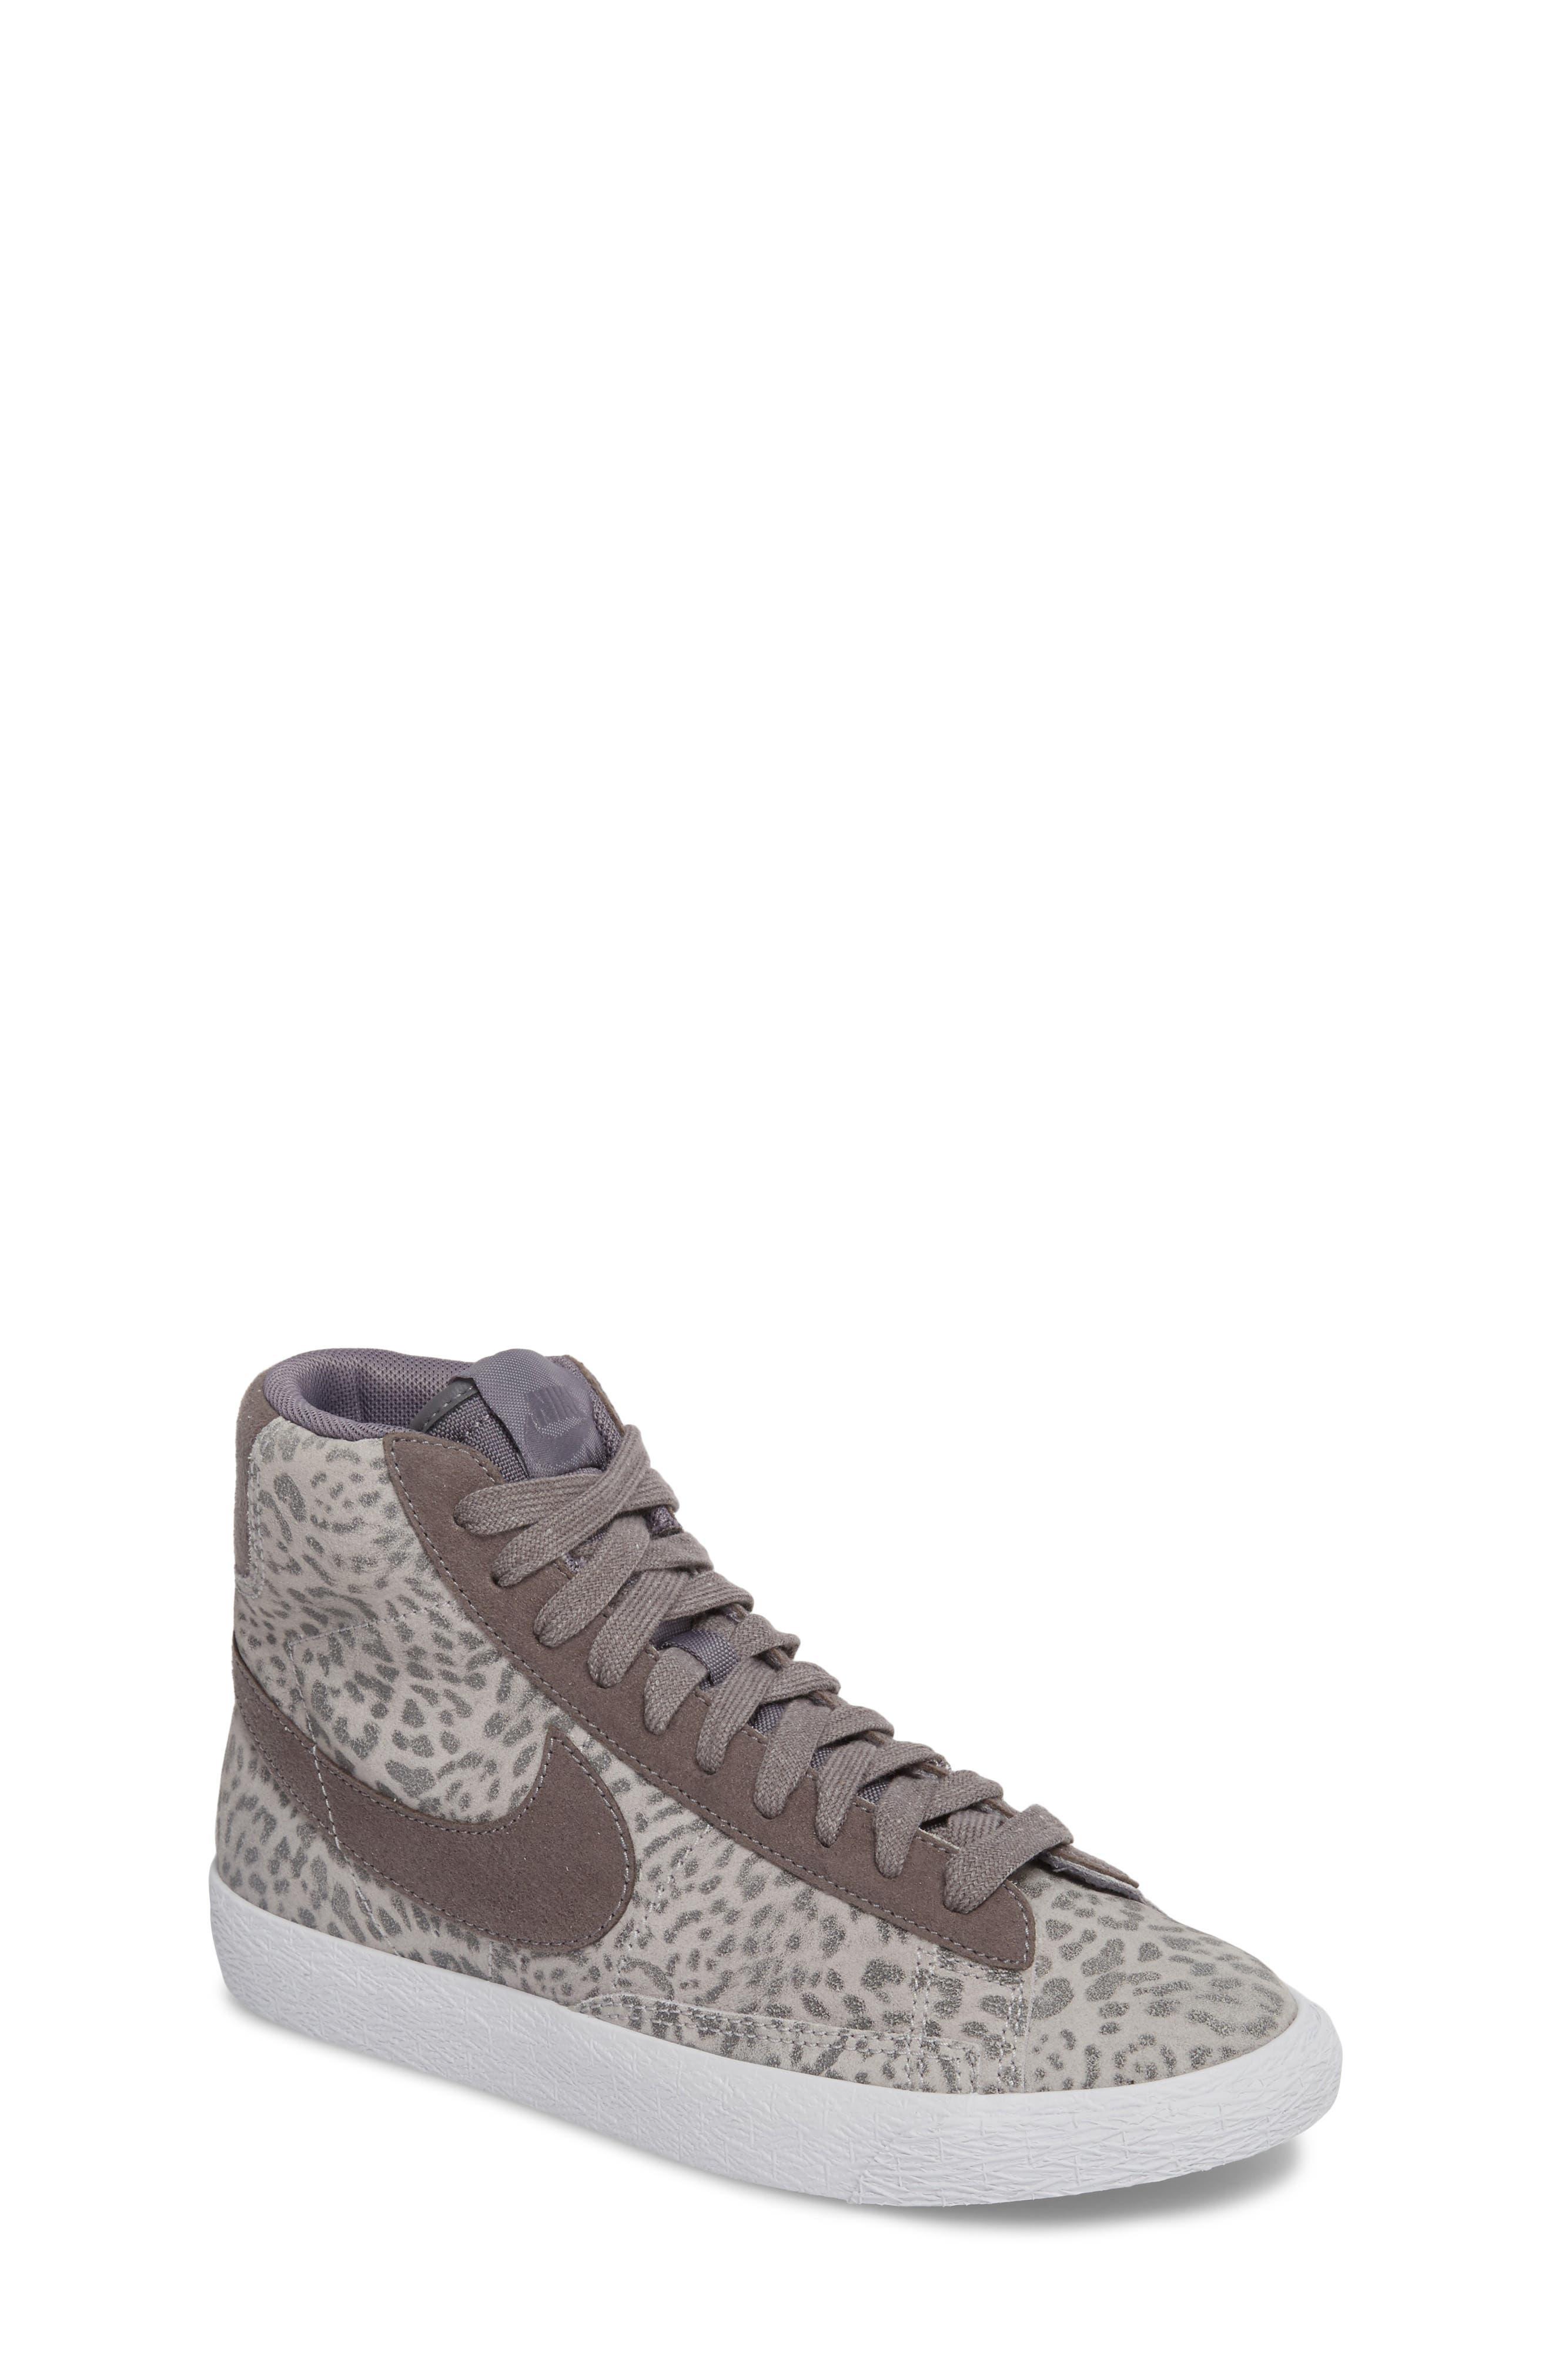 Blazer Mid SE High Top Sneaker,                         Main,                         color, Atmosphere Grey/ Smoke/ Gum